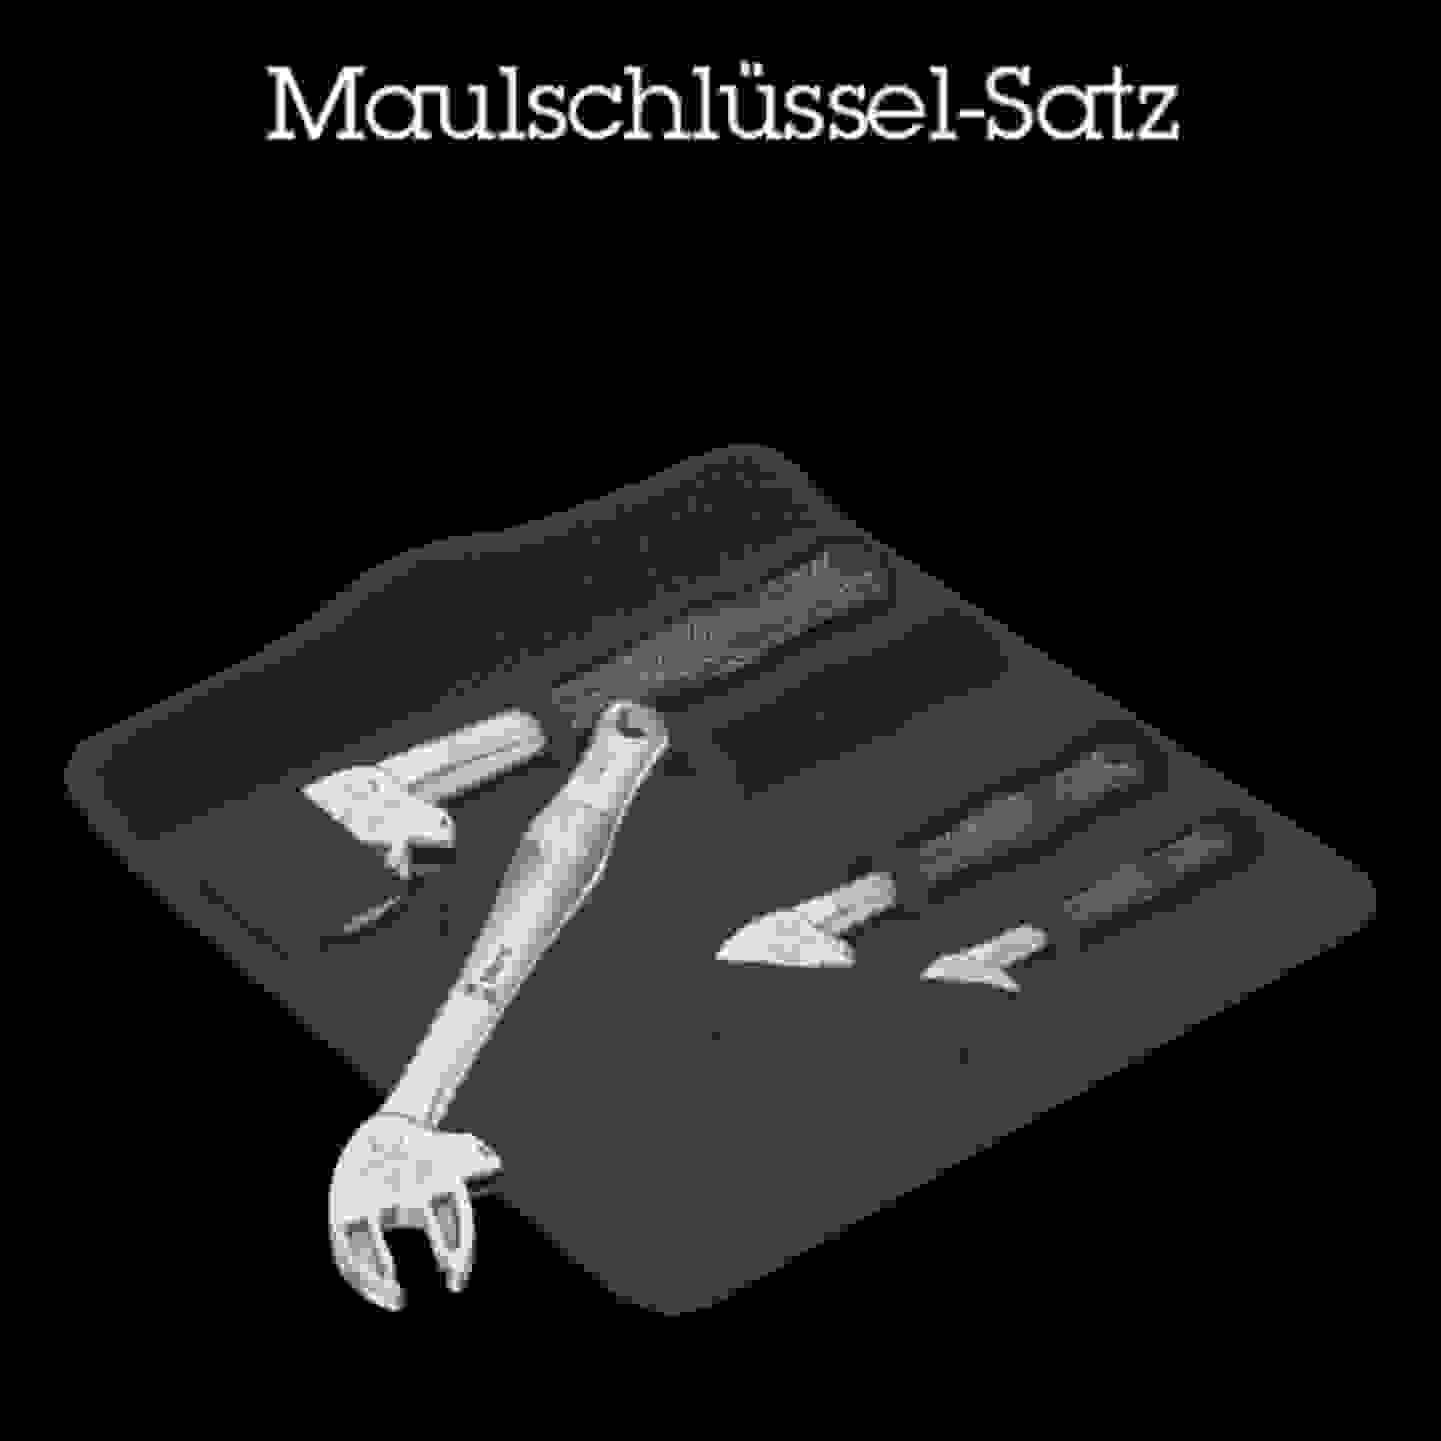 Maulschlüssel-Satz